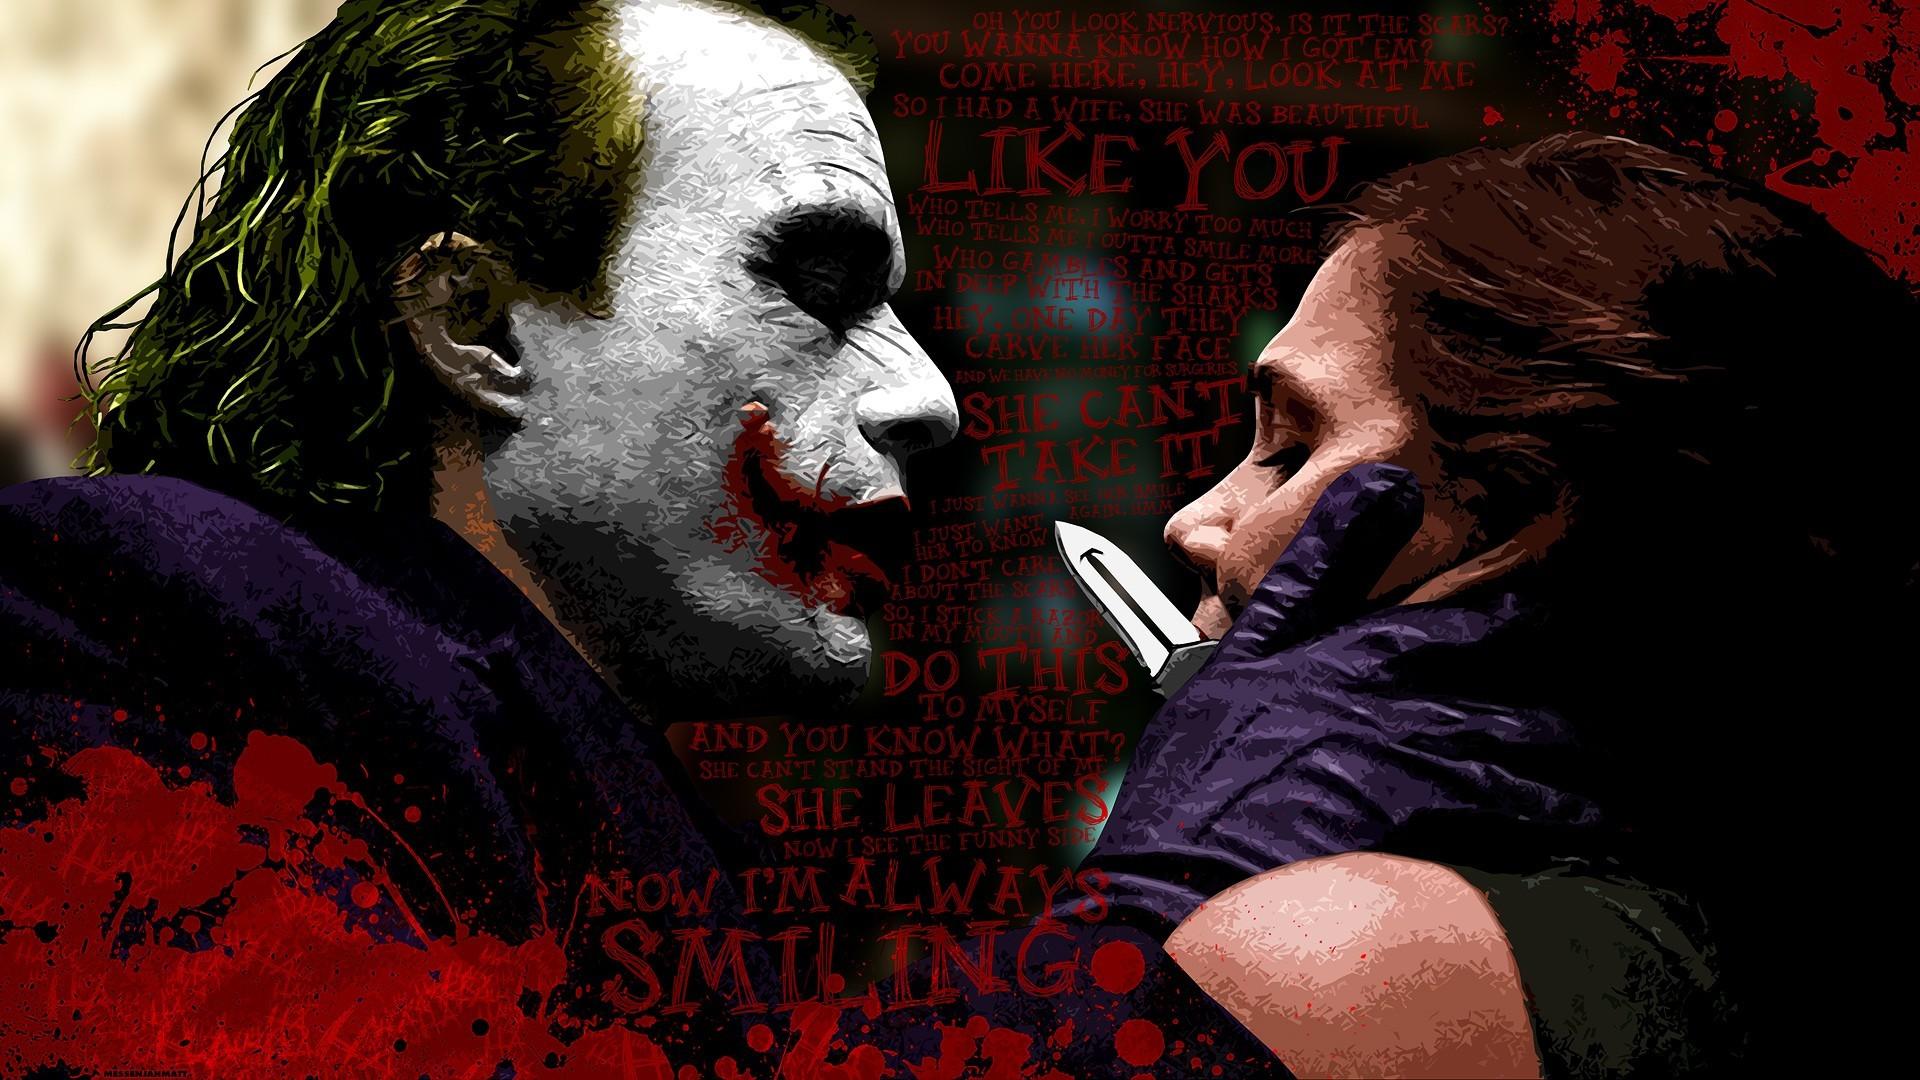 Quotes Batman Maggie Gyllenhaal Rachel Dawes Dark Knight Joker Blood  Splatters Knives Typography #quotes #